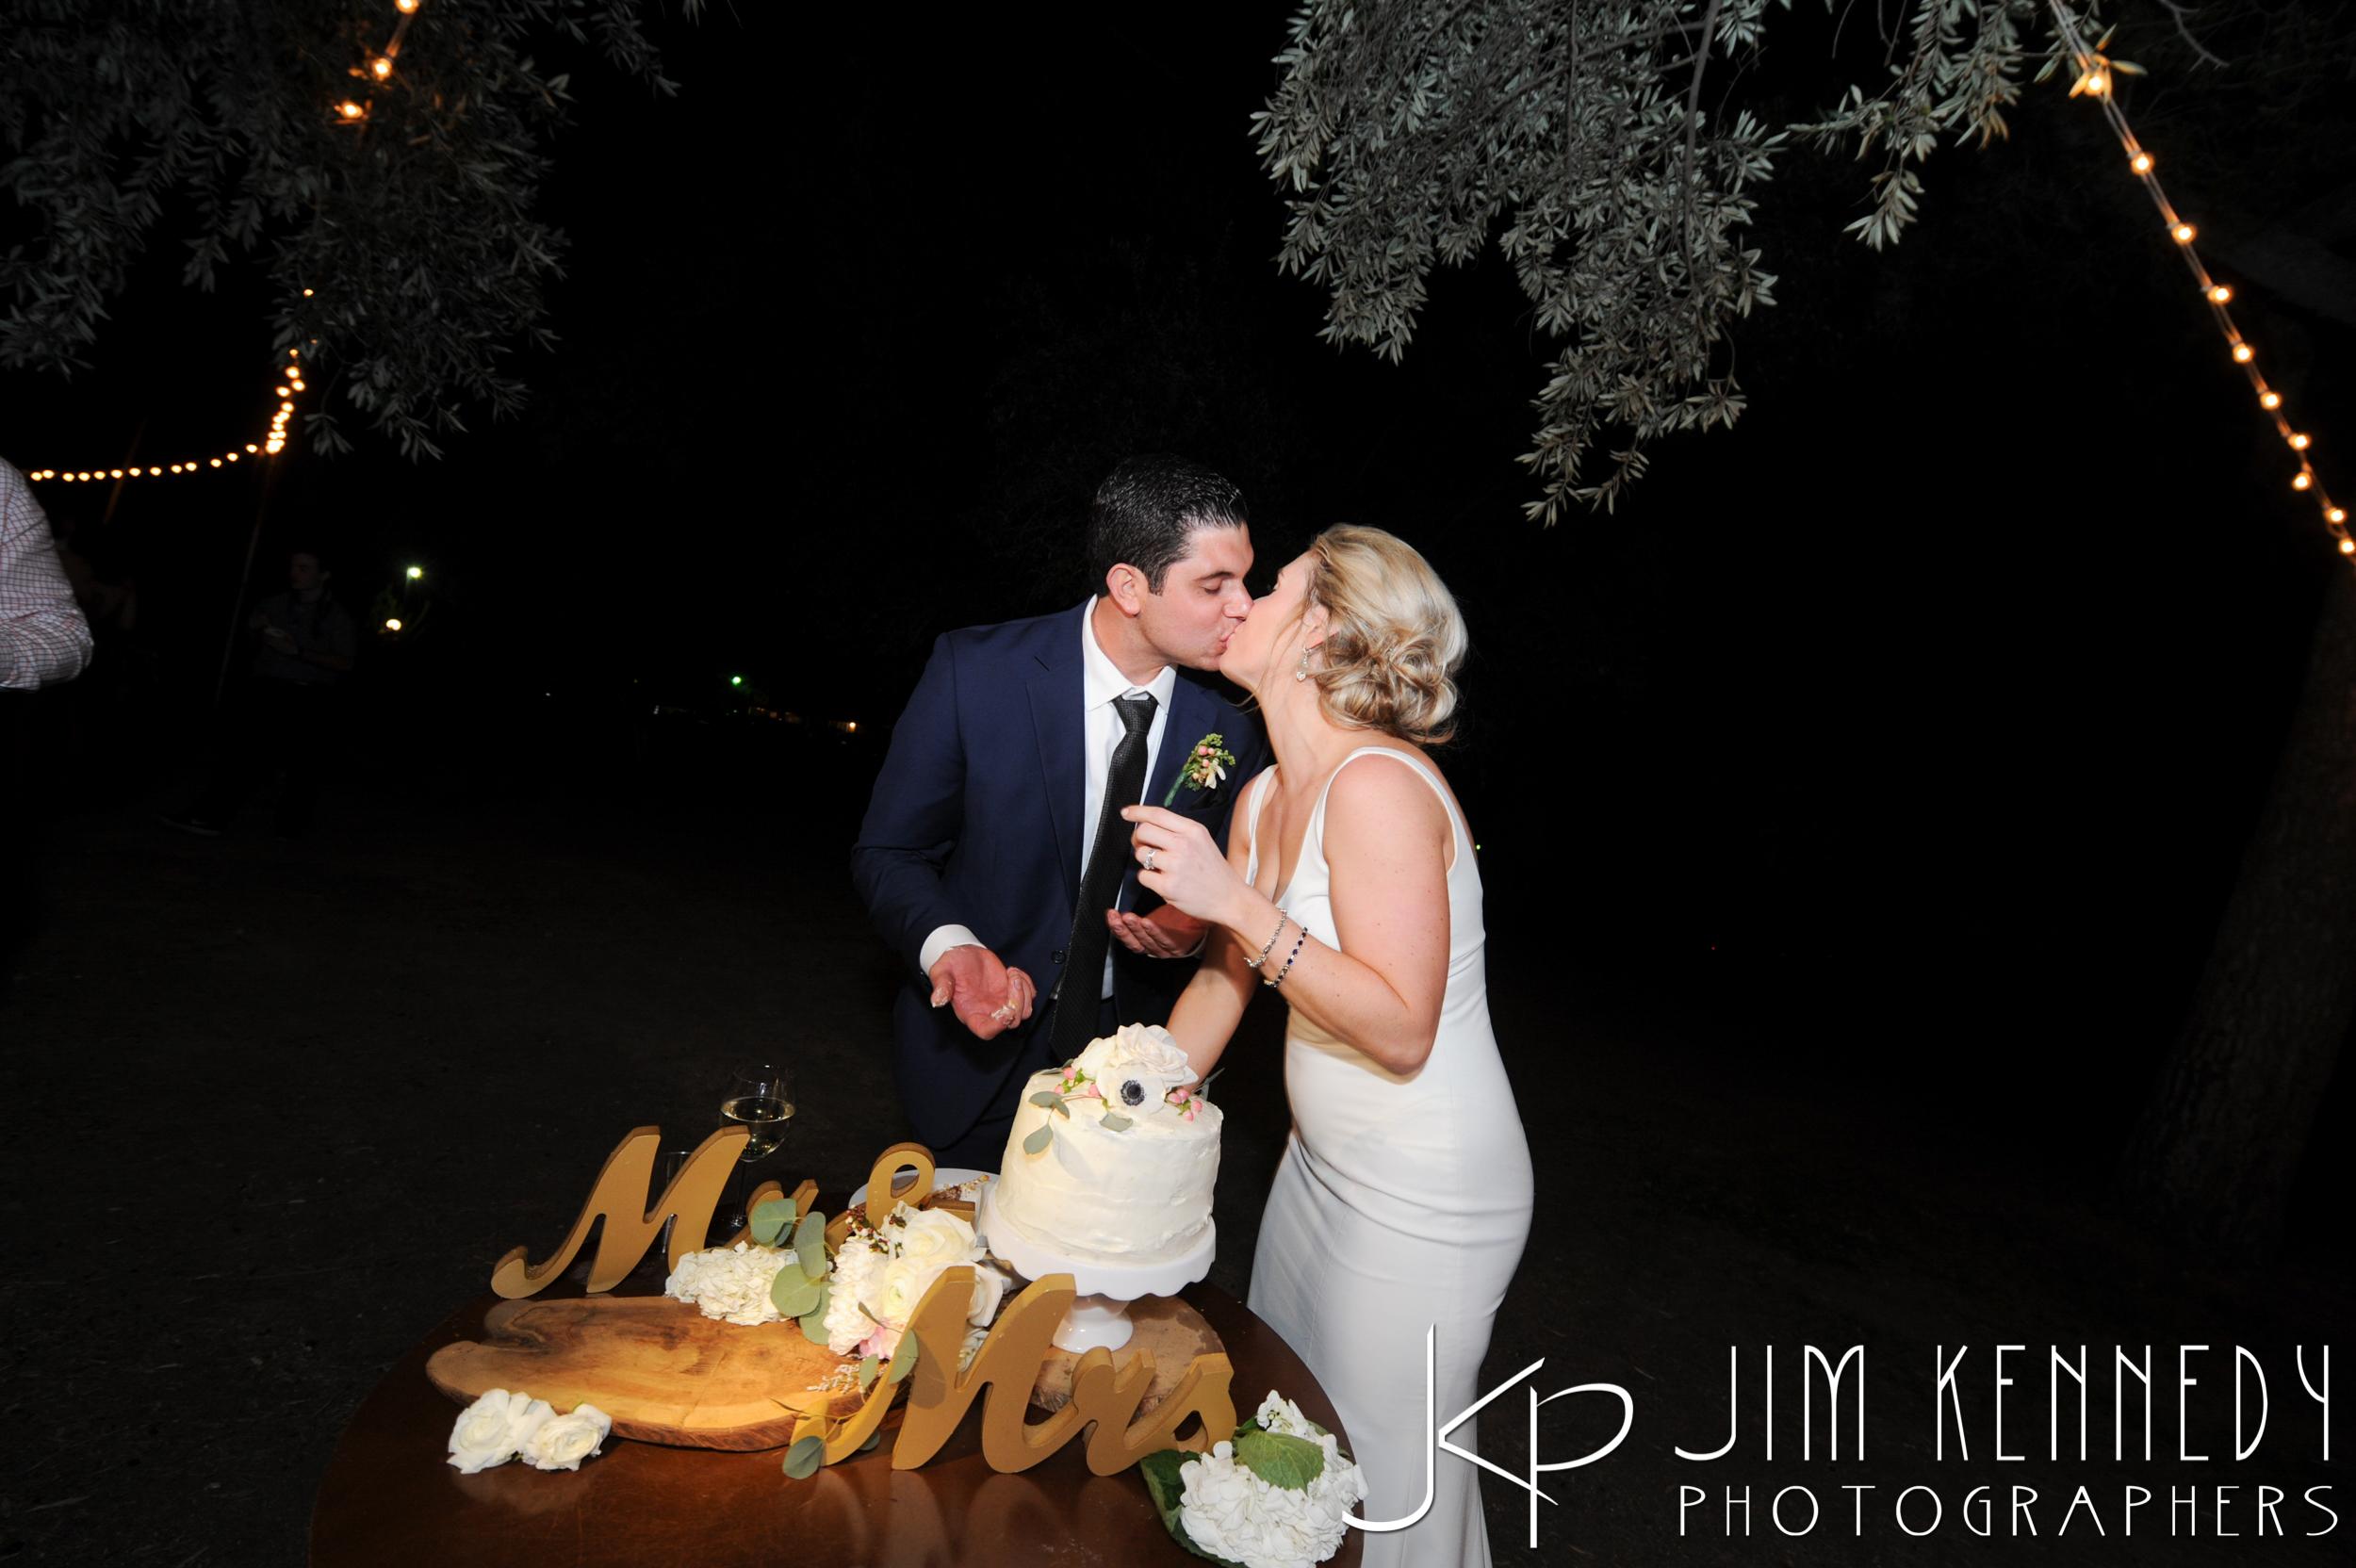 jim_kennedy_photographers_highland_springs_wedding_caitlyn_0220.jpg